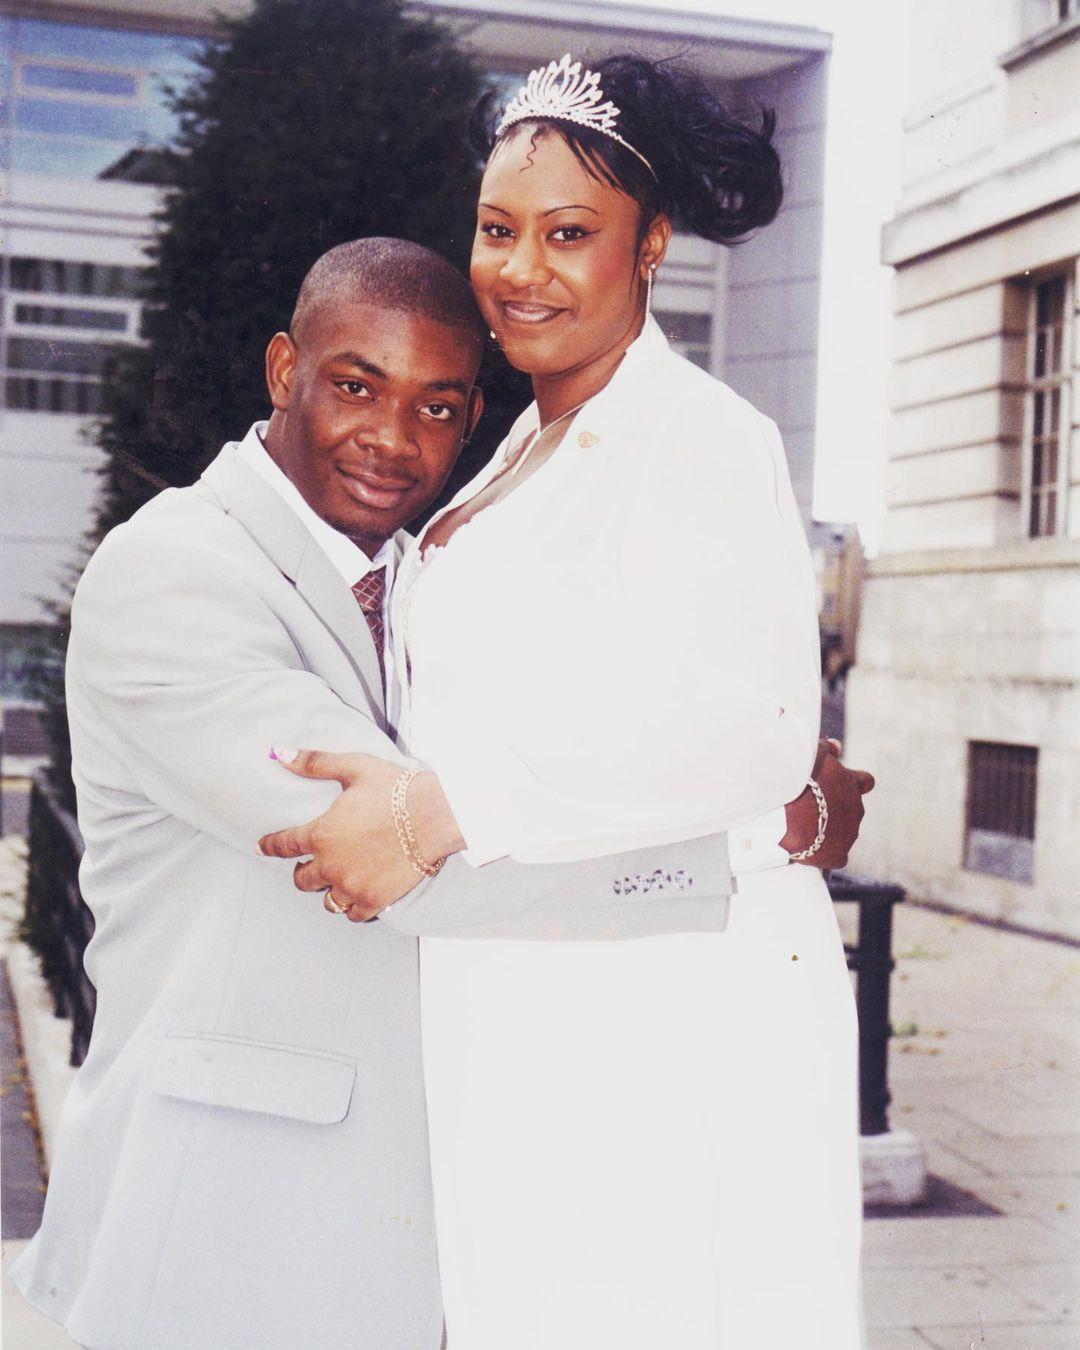 dmx-hospitalized-life-support-don-jazzy-married-tottenham-hotspur-davinson-sanchez-racism-latest-news-global-world-stories-monday-april-2021-style-rave